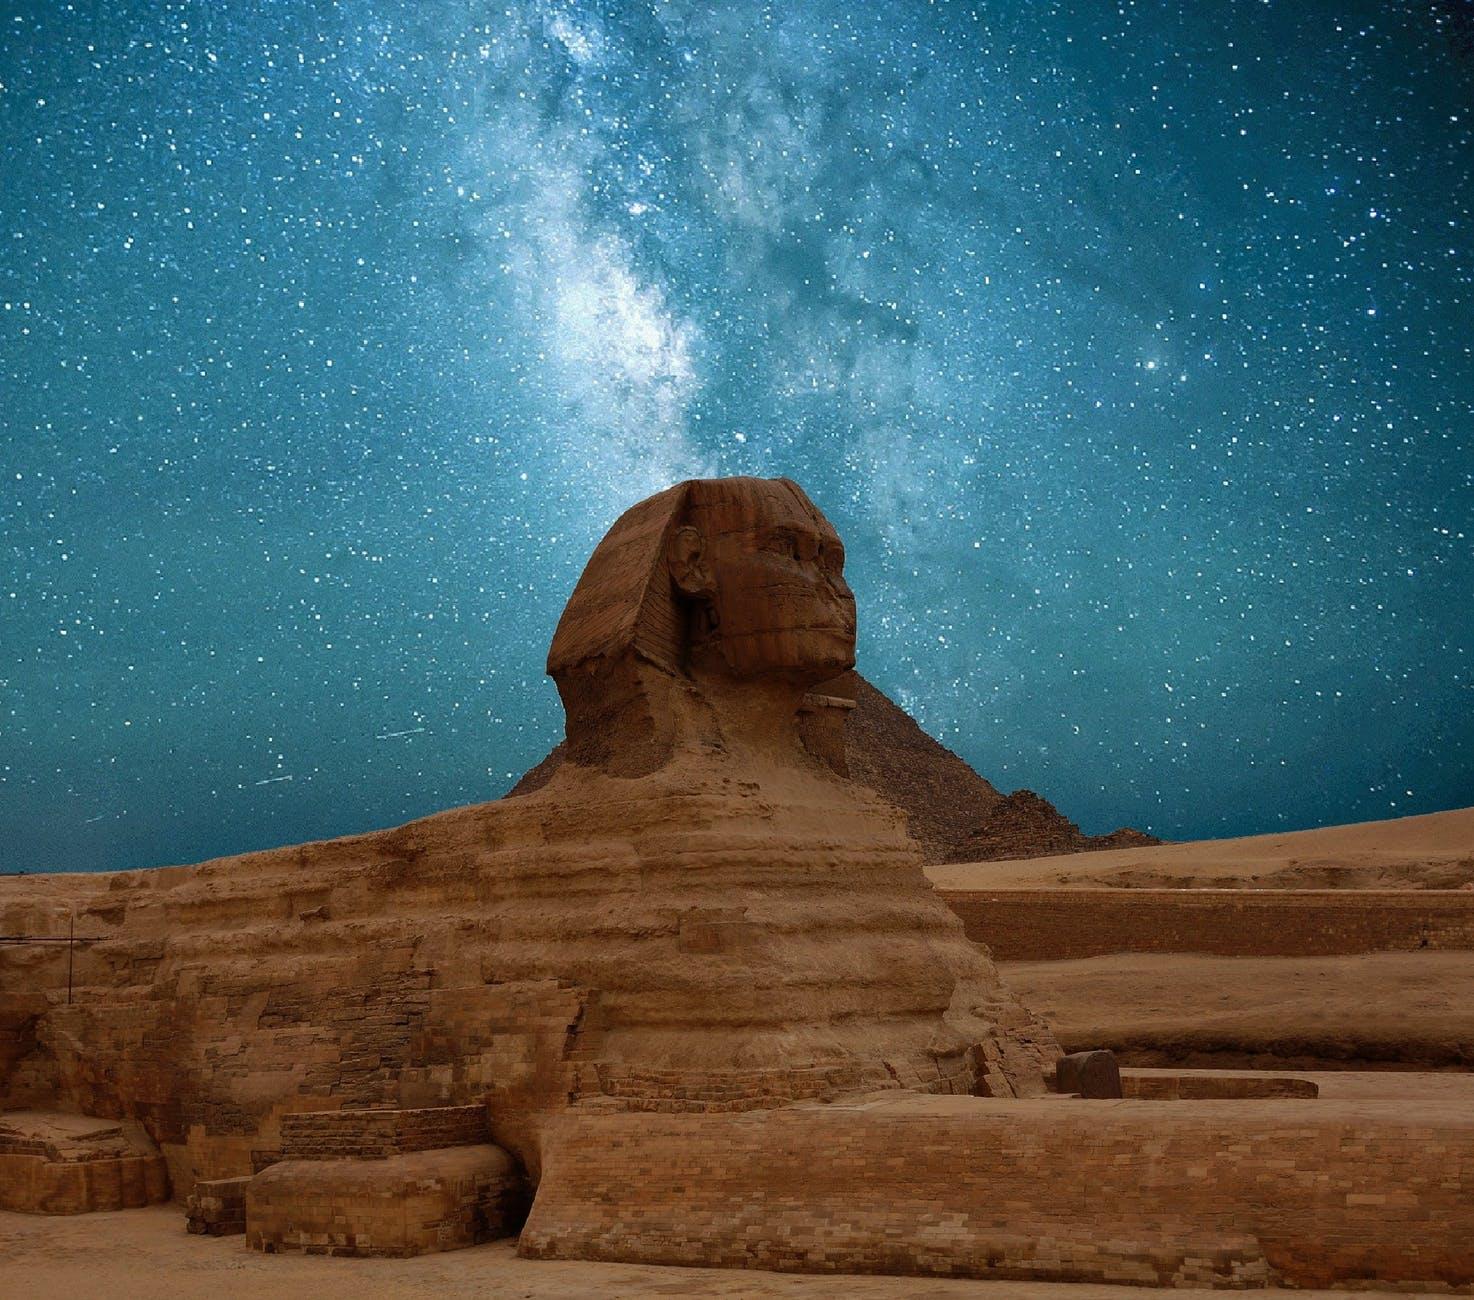 ancient architecture art cosmos